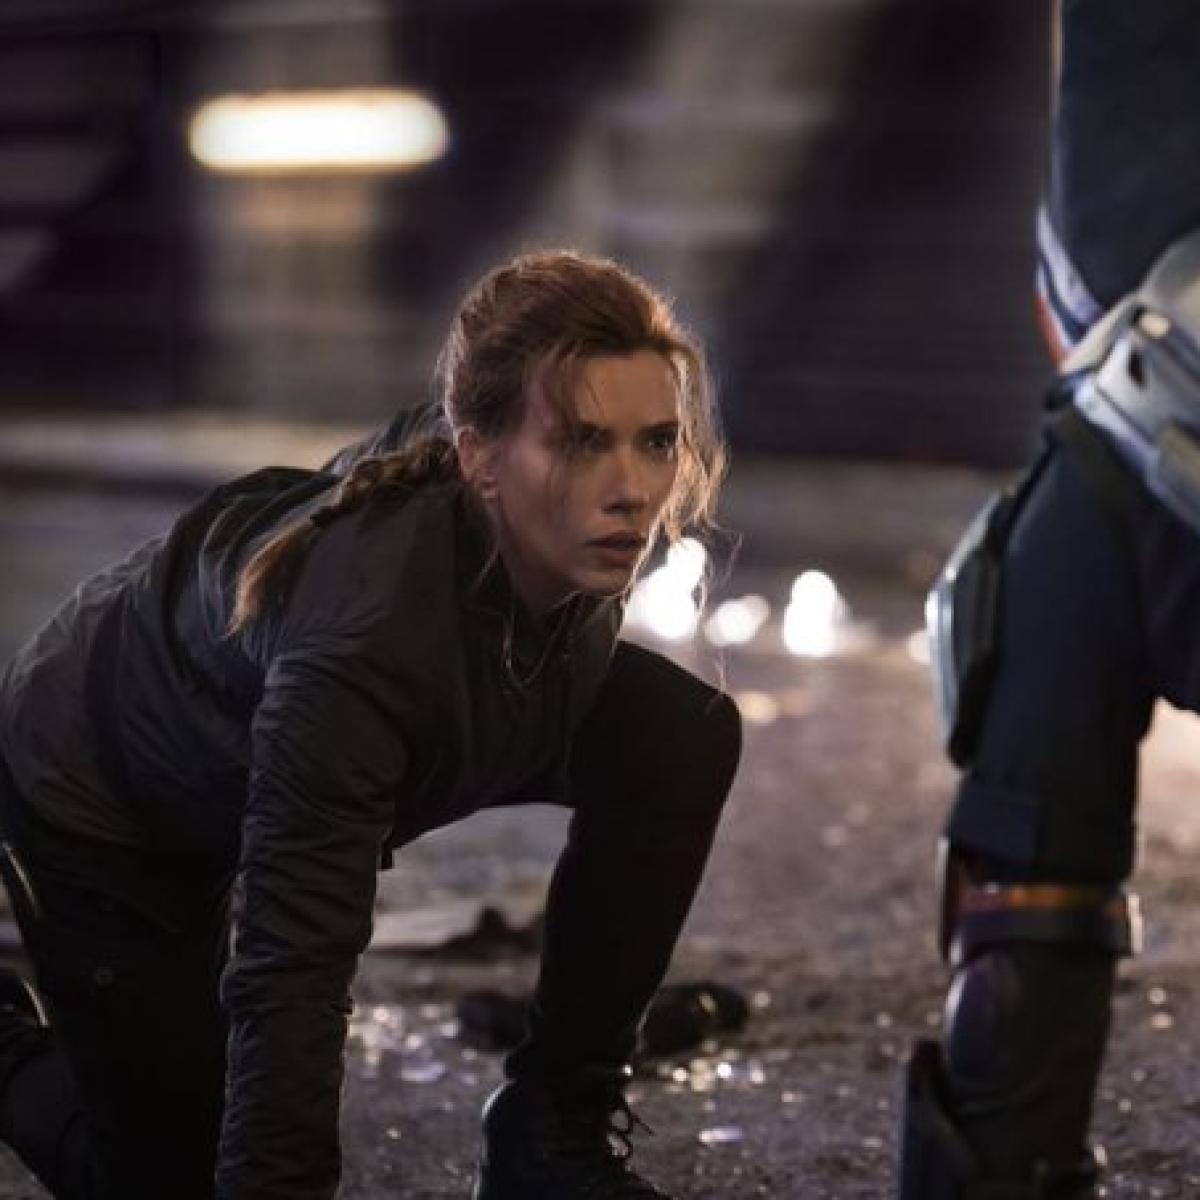 Black Widow: New trailer shows Natasha Romanoff confronting darker parts of her past